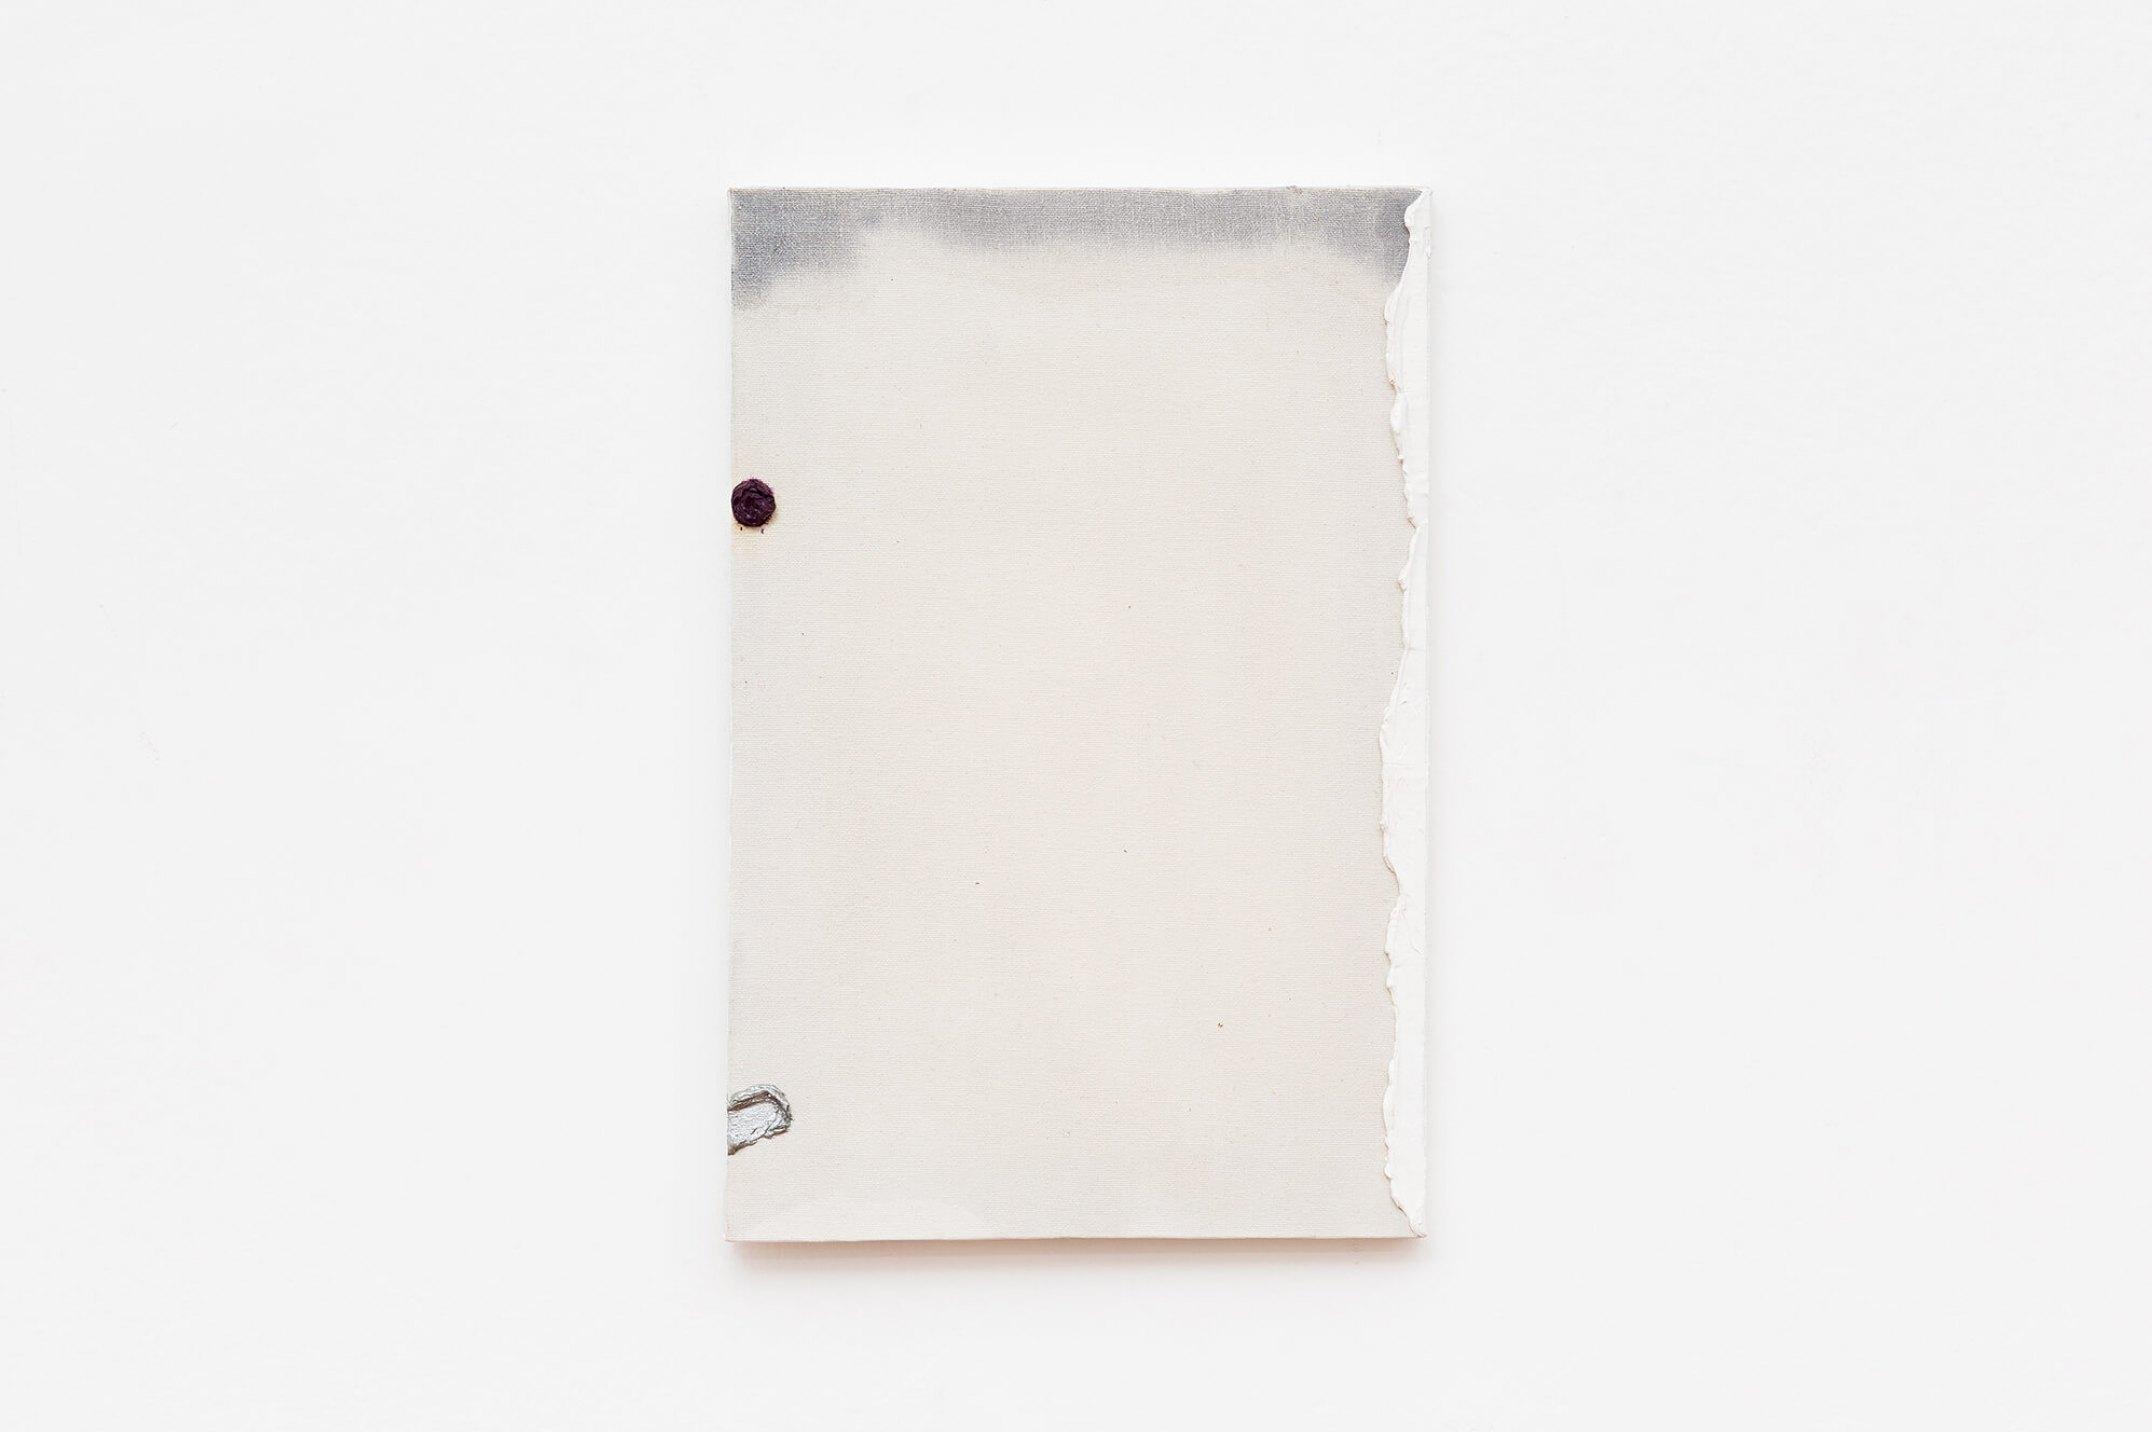 Paulo Monteiro,<em>untitled</em>,2012, oil on canvas, 30 × 20 cm - Mendes Wood DM